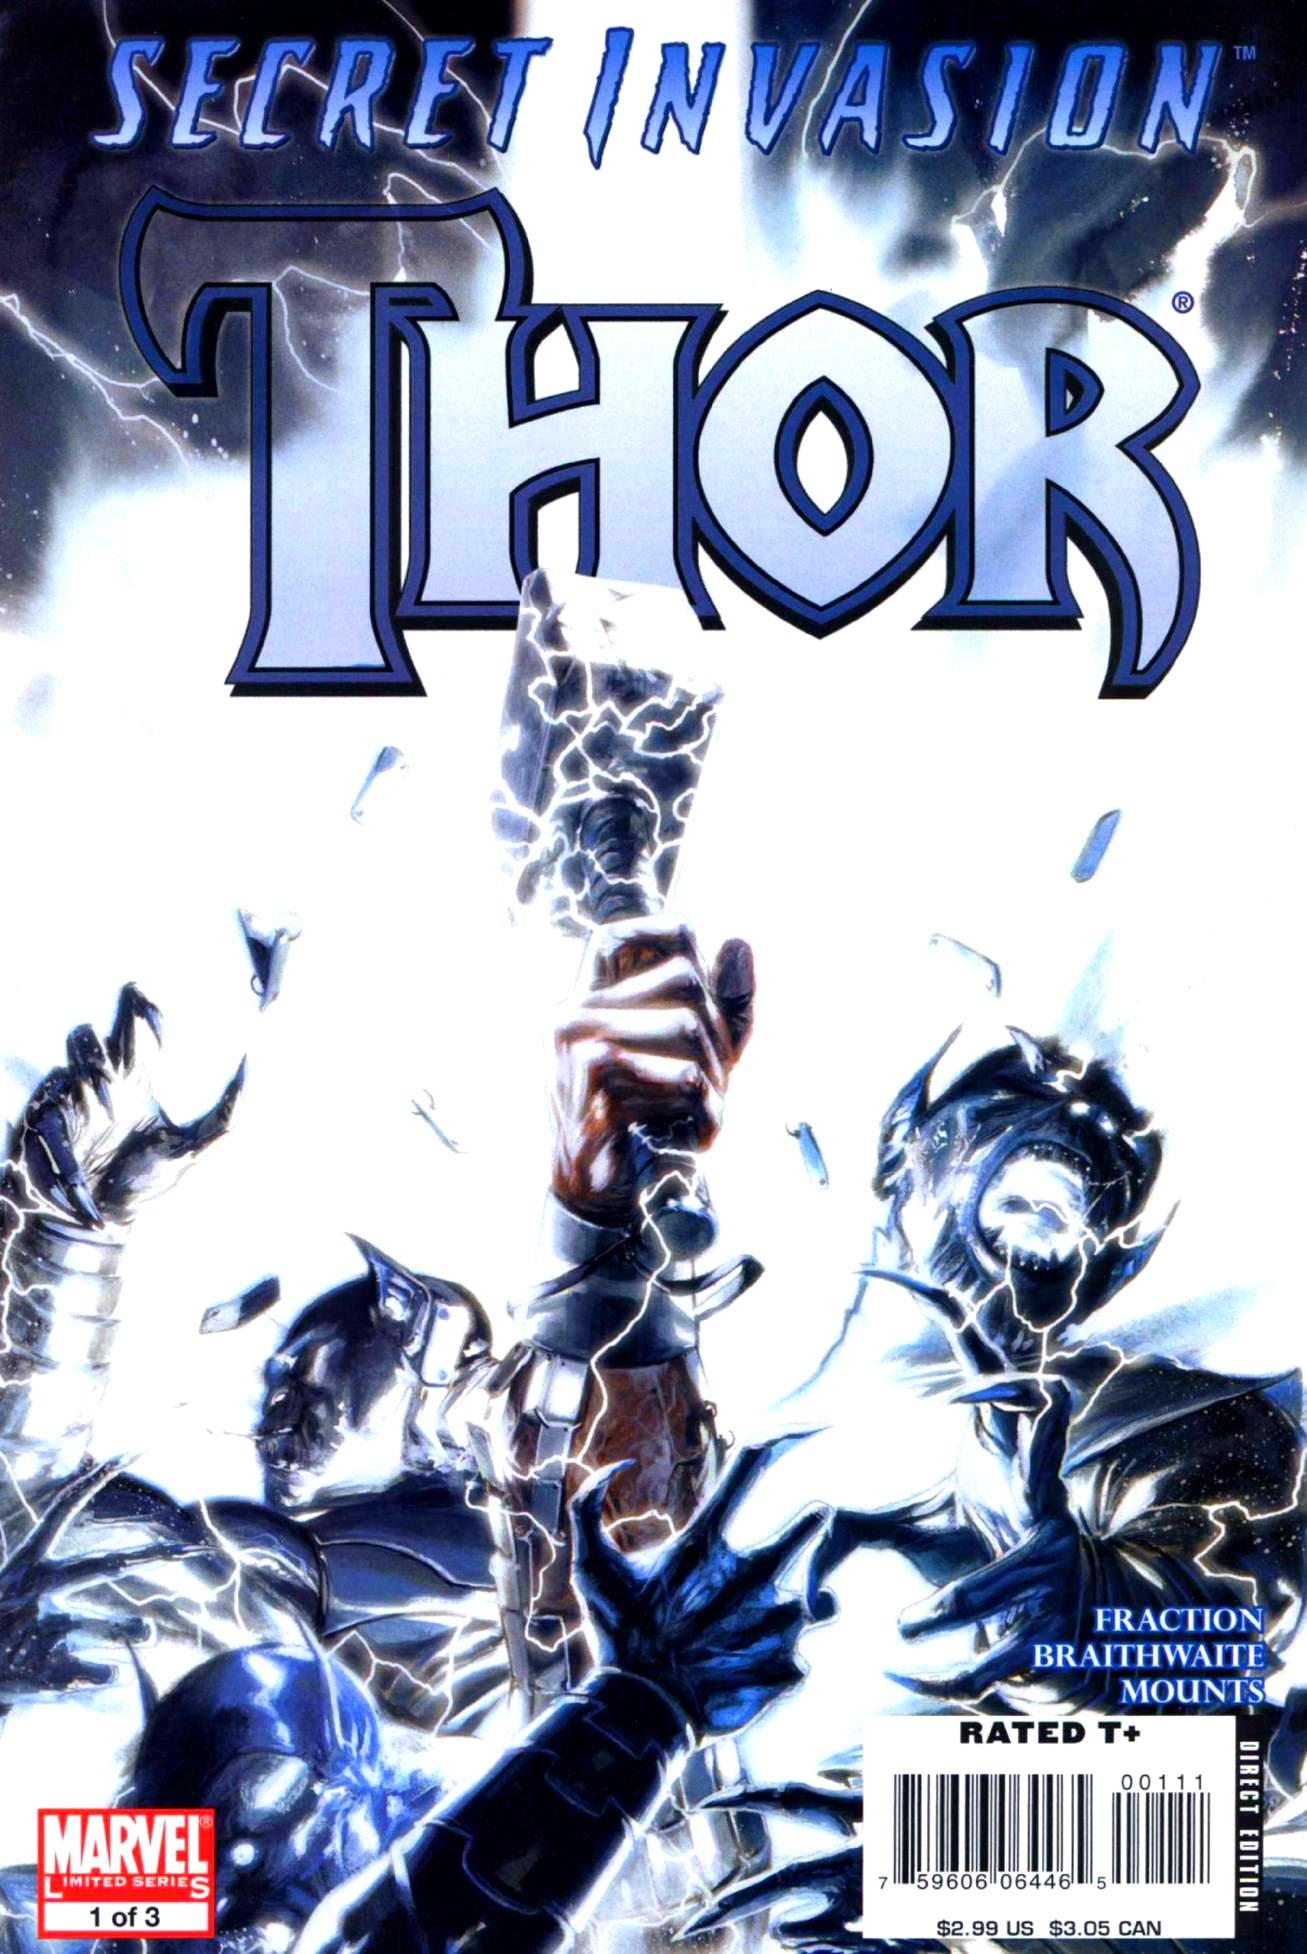 Read online Secret Invasion: Thor comic -  Issue #1 - 1